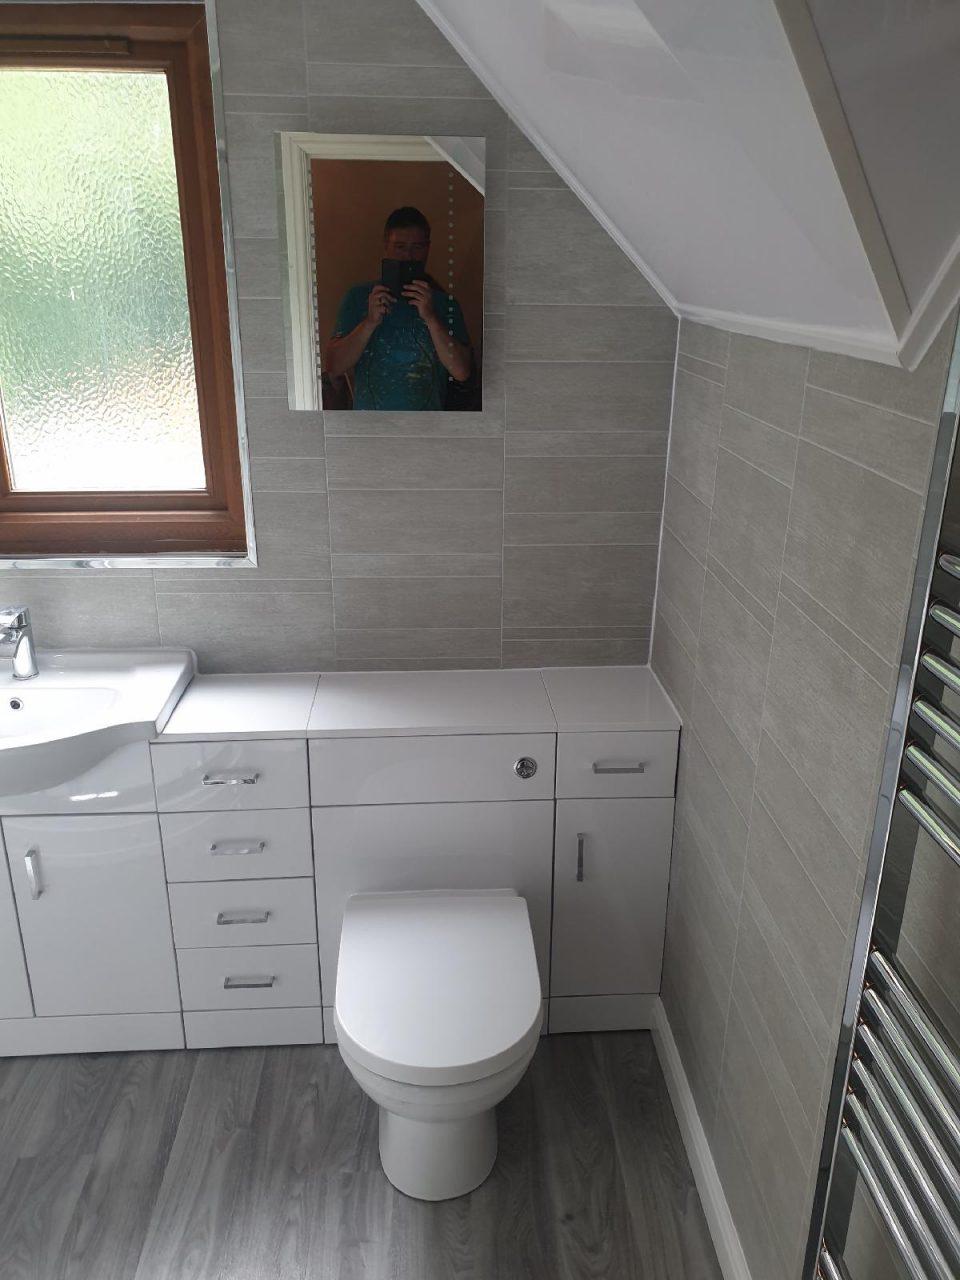 New Bathroom Mrs Wootton in Birmingham Toilet built in